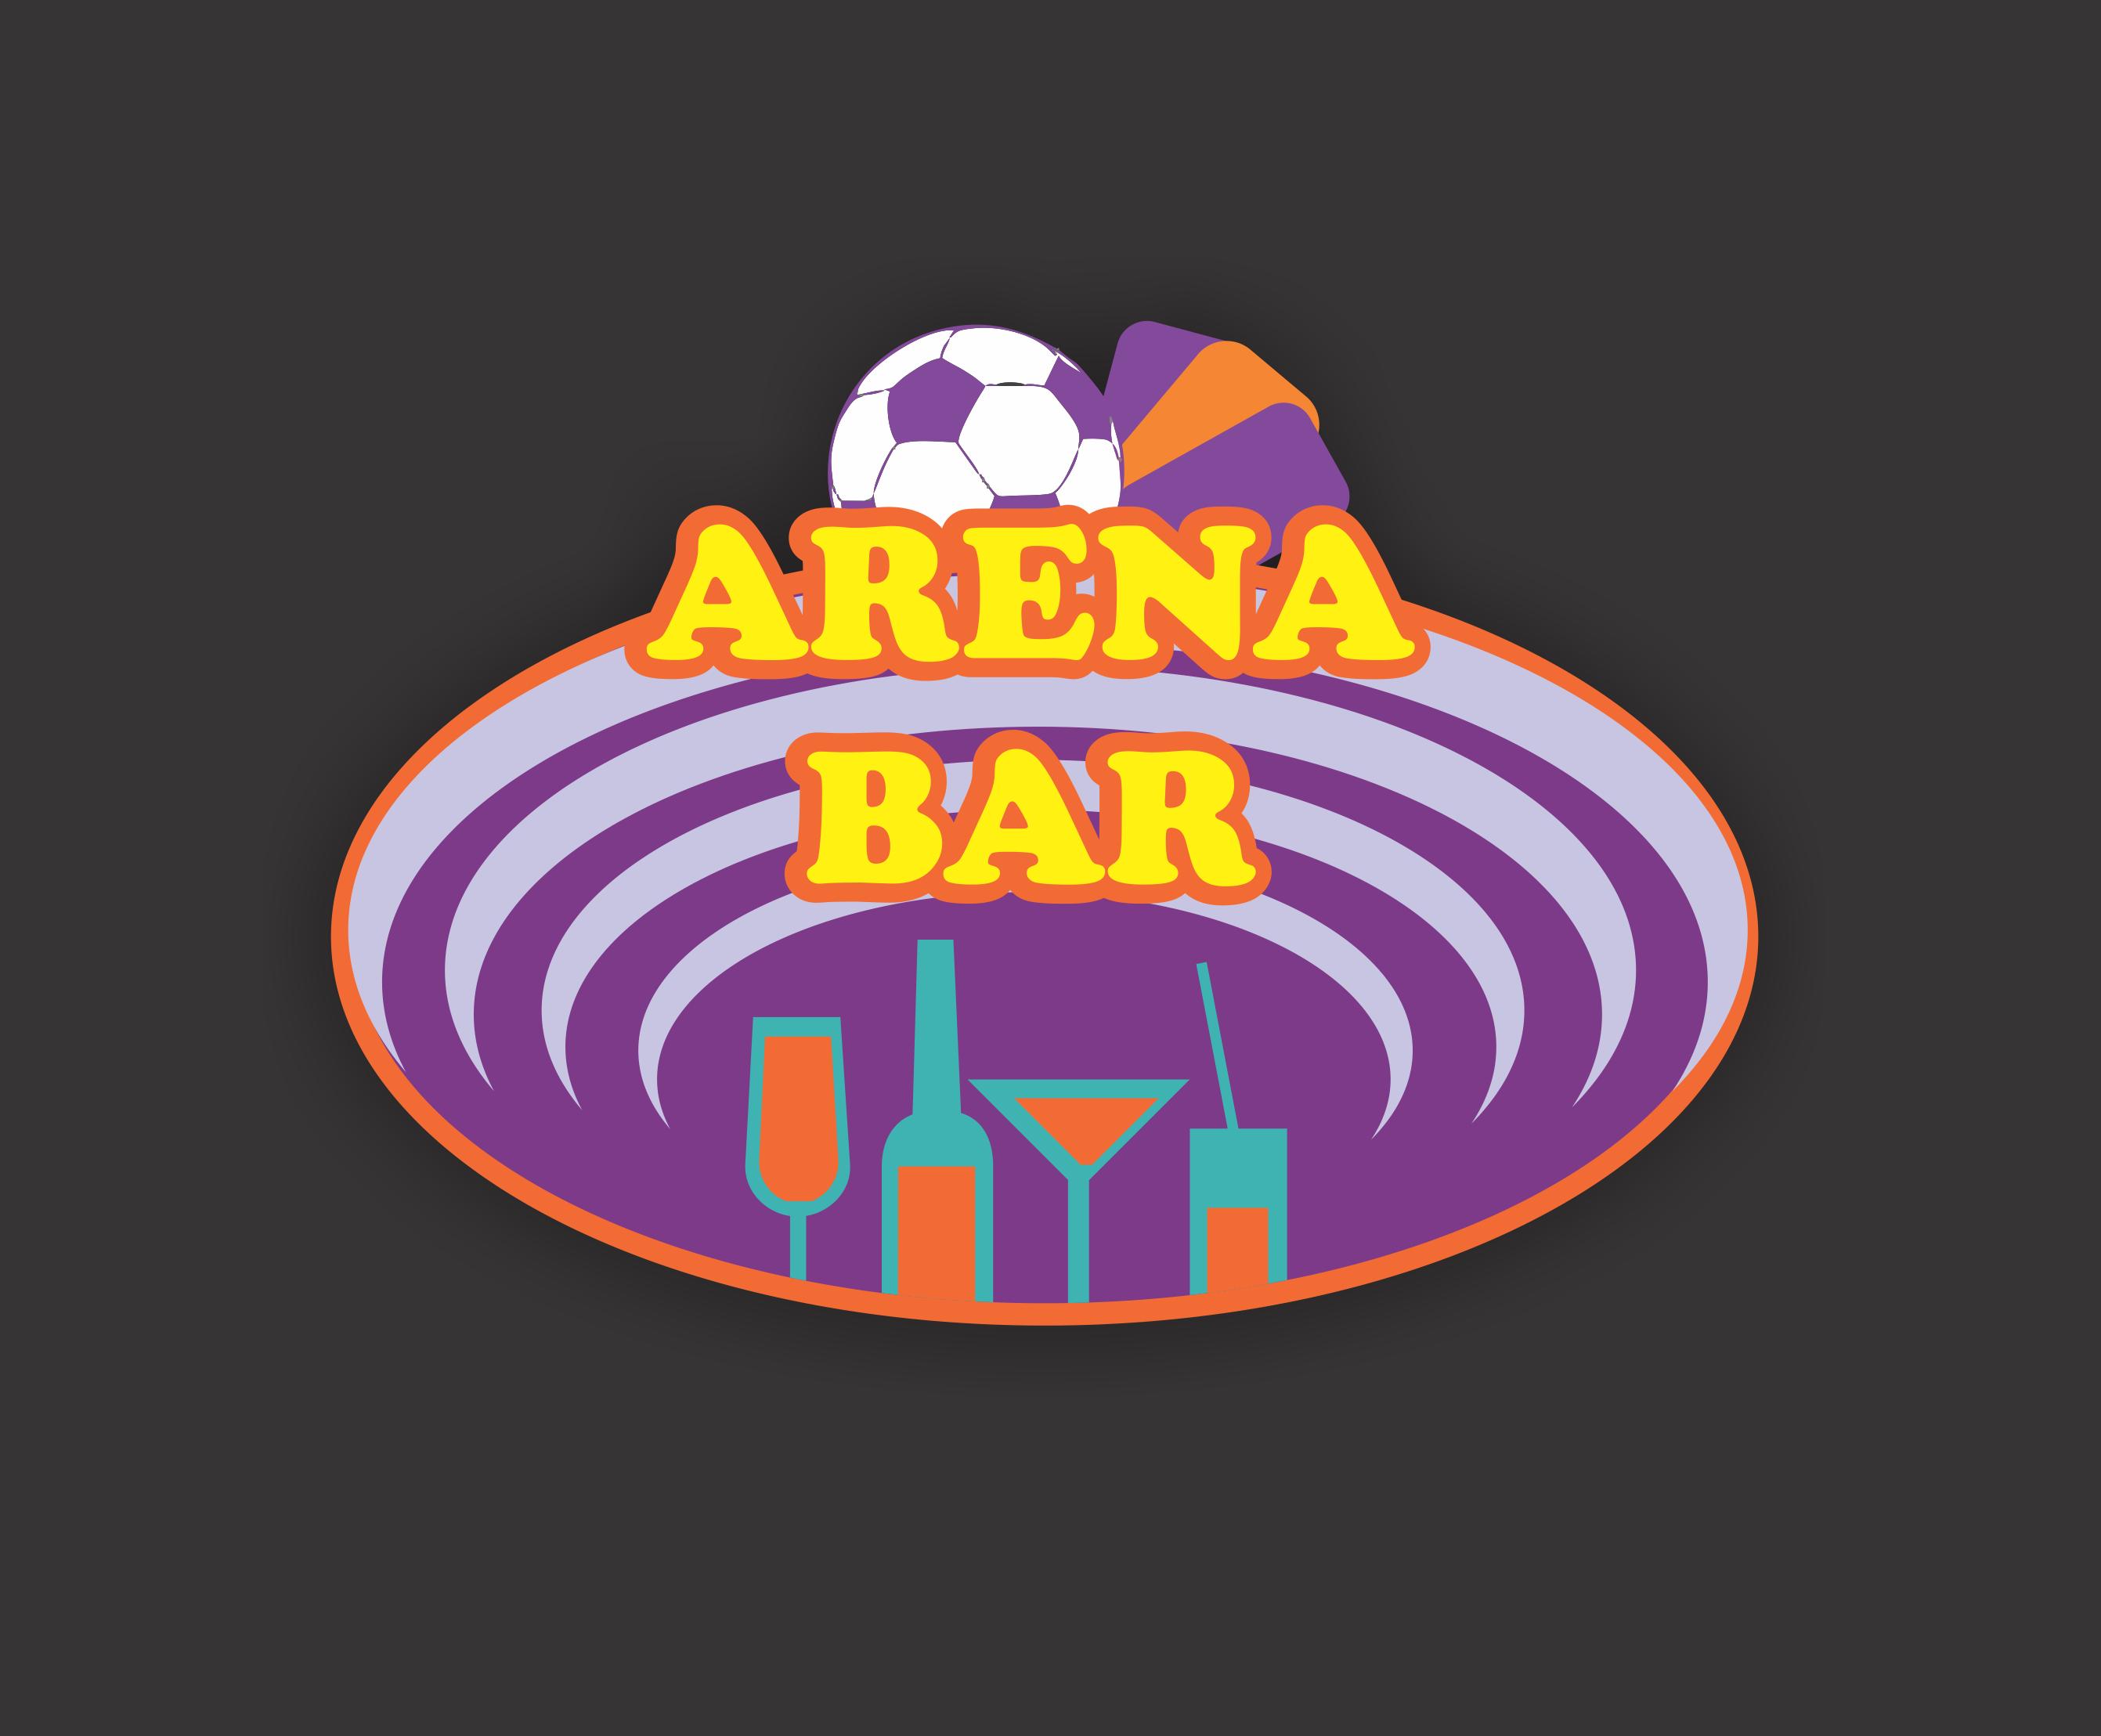 Разработка логотипа для бара! фото f_6365dcc59745460c.png